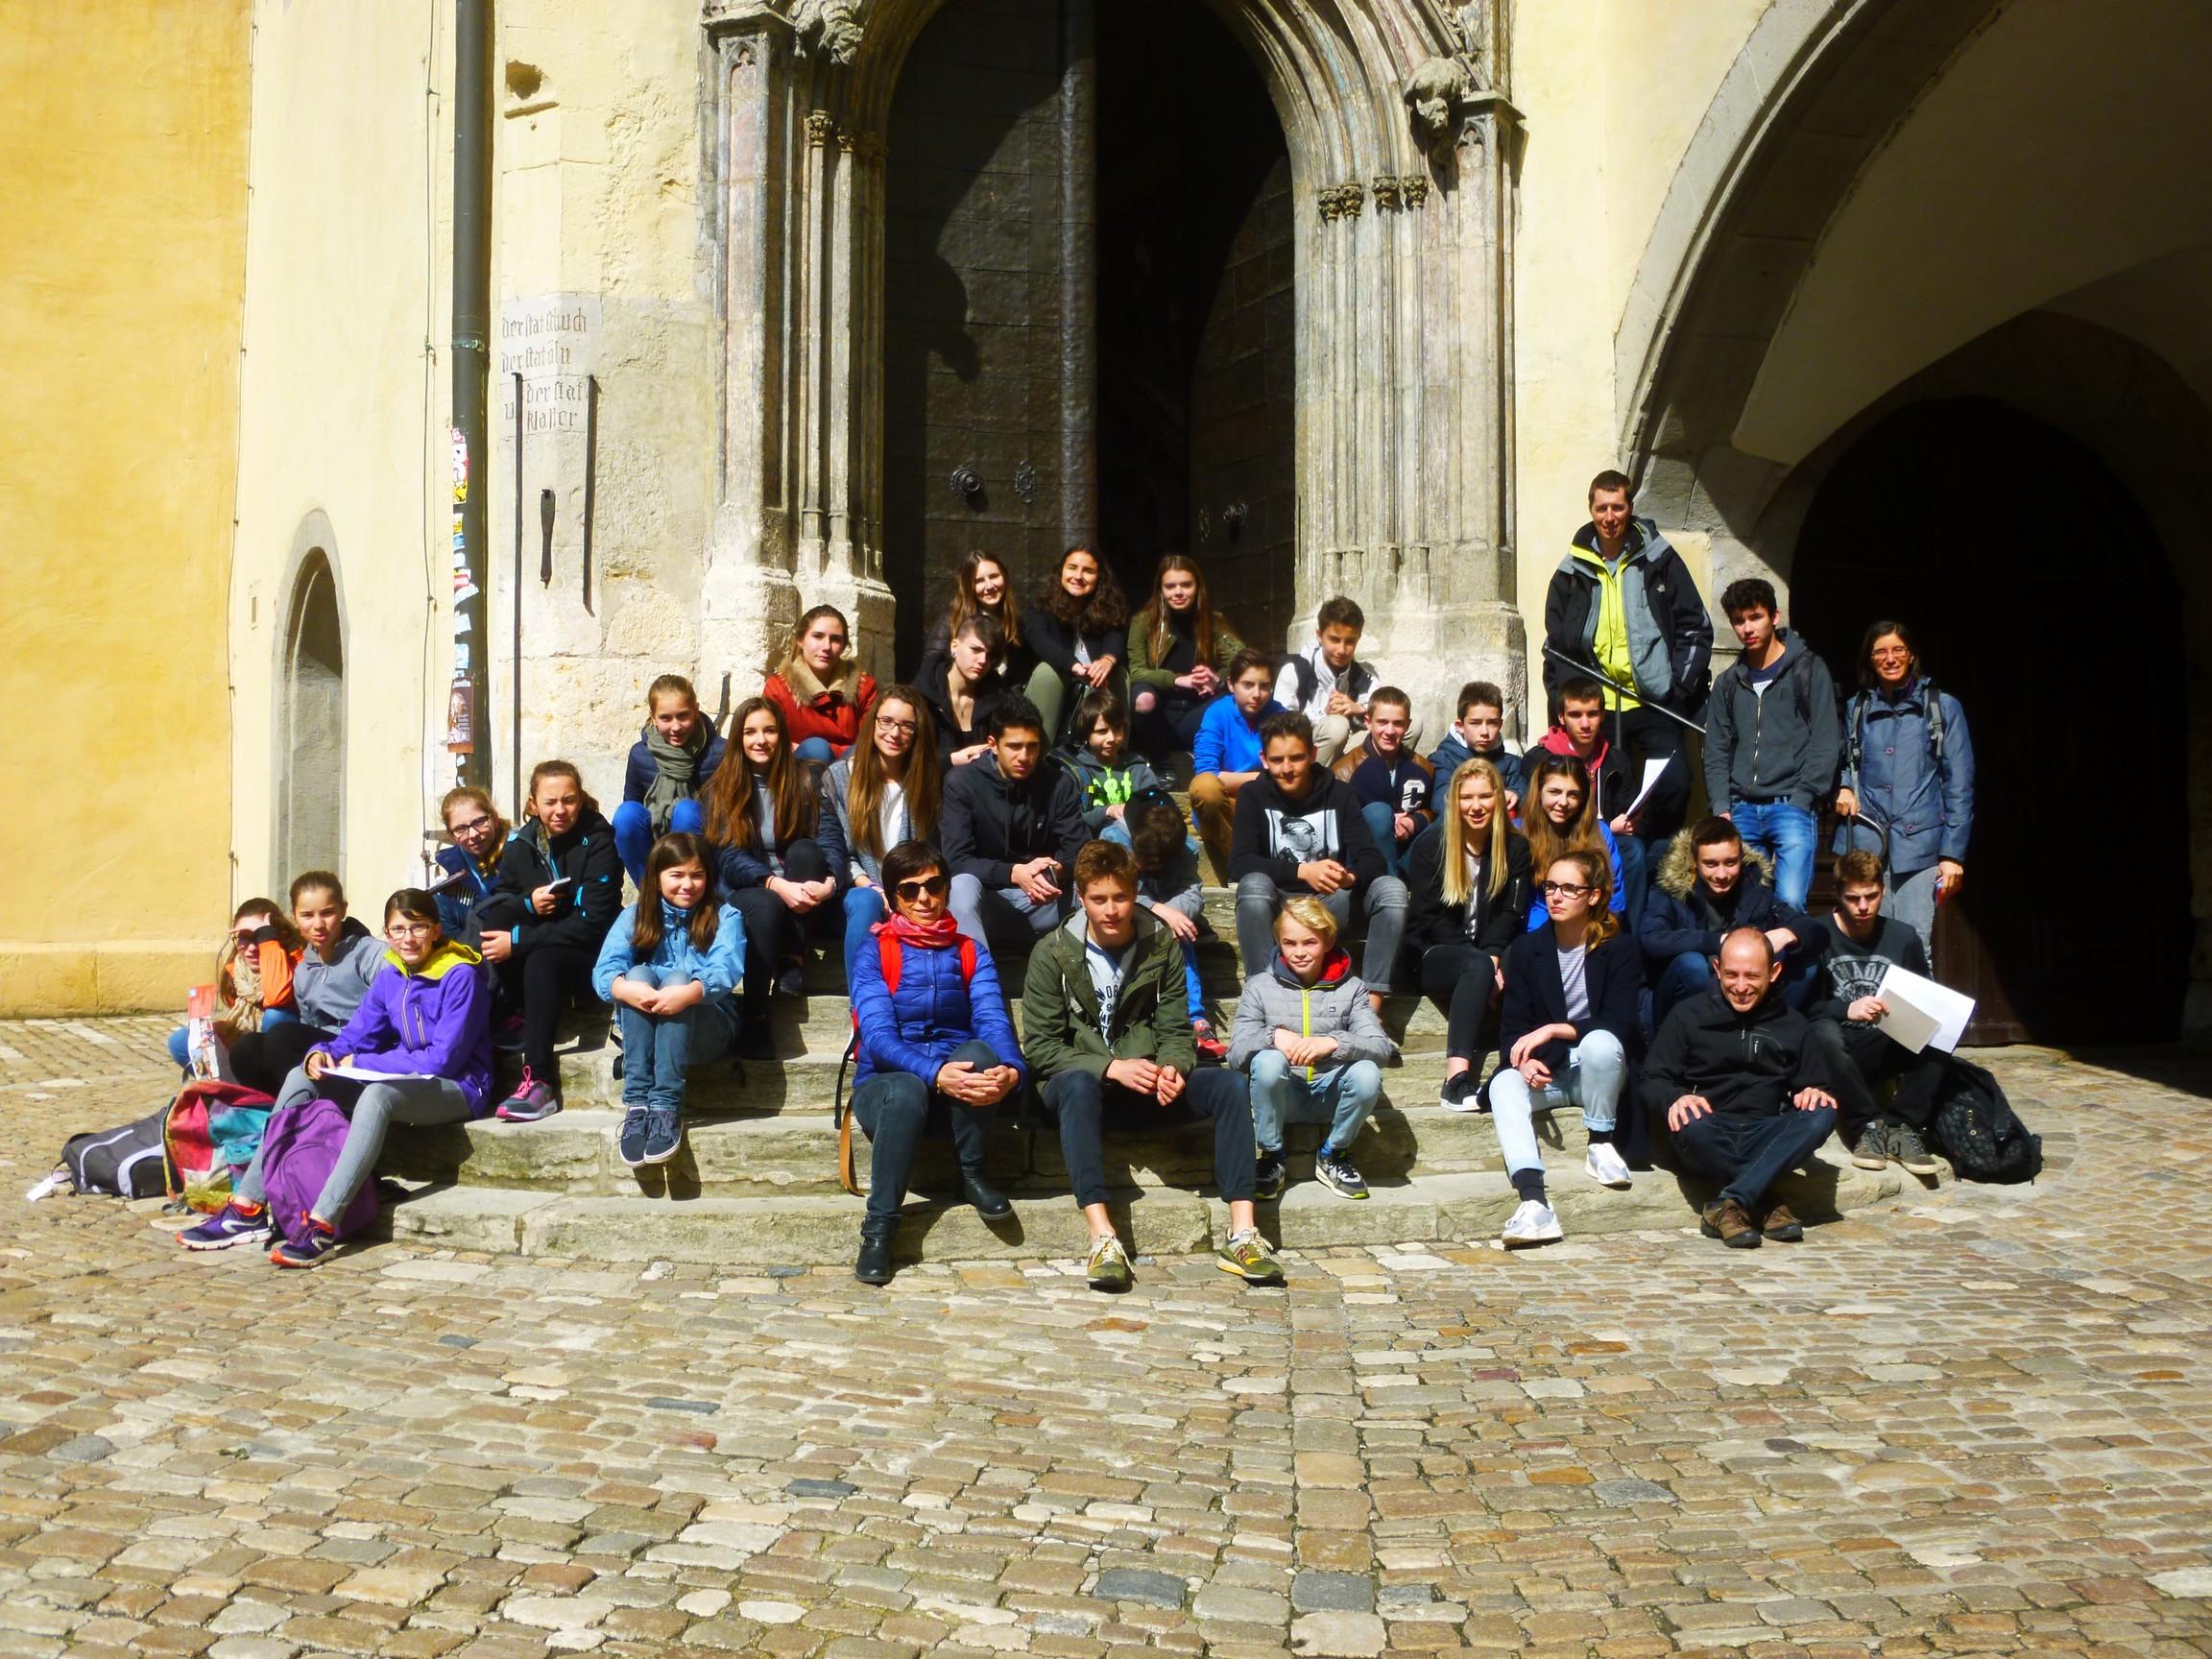 Visite à Regensburg